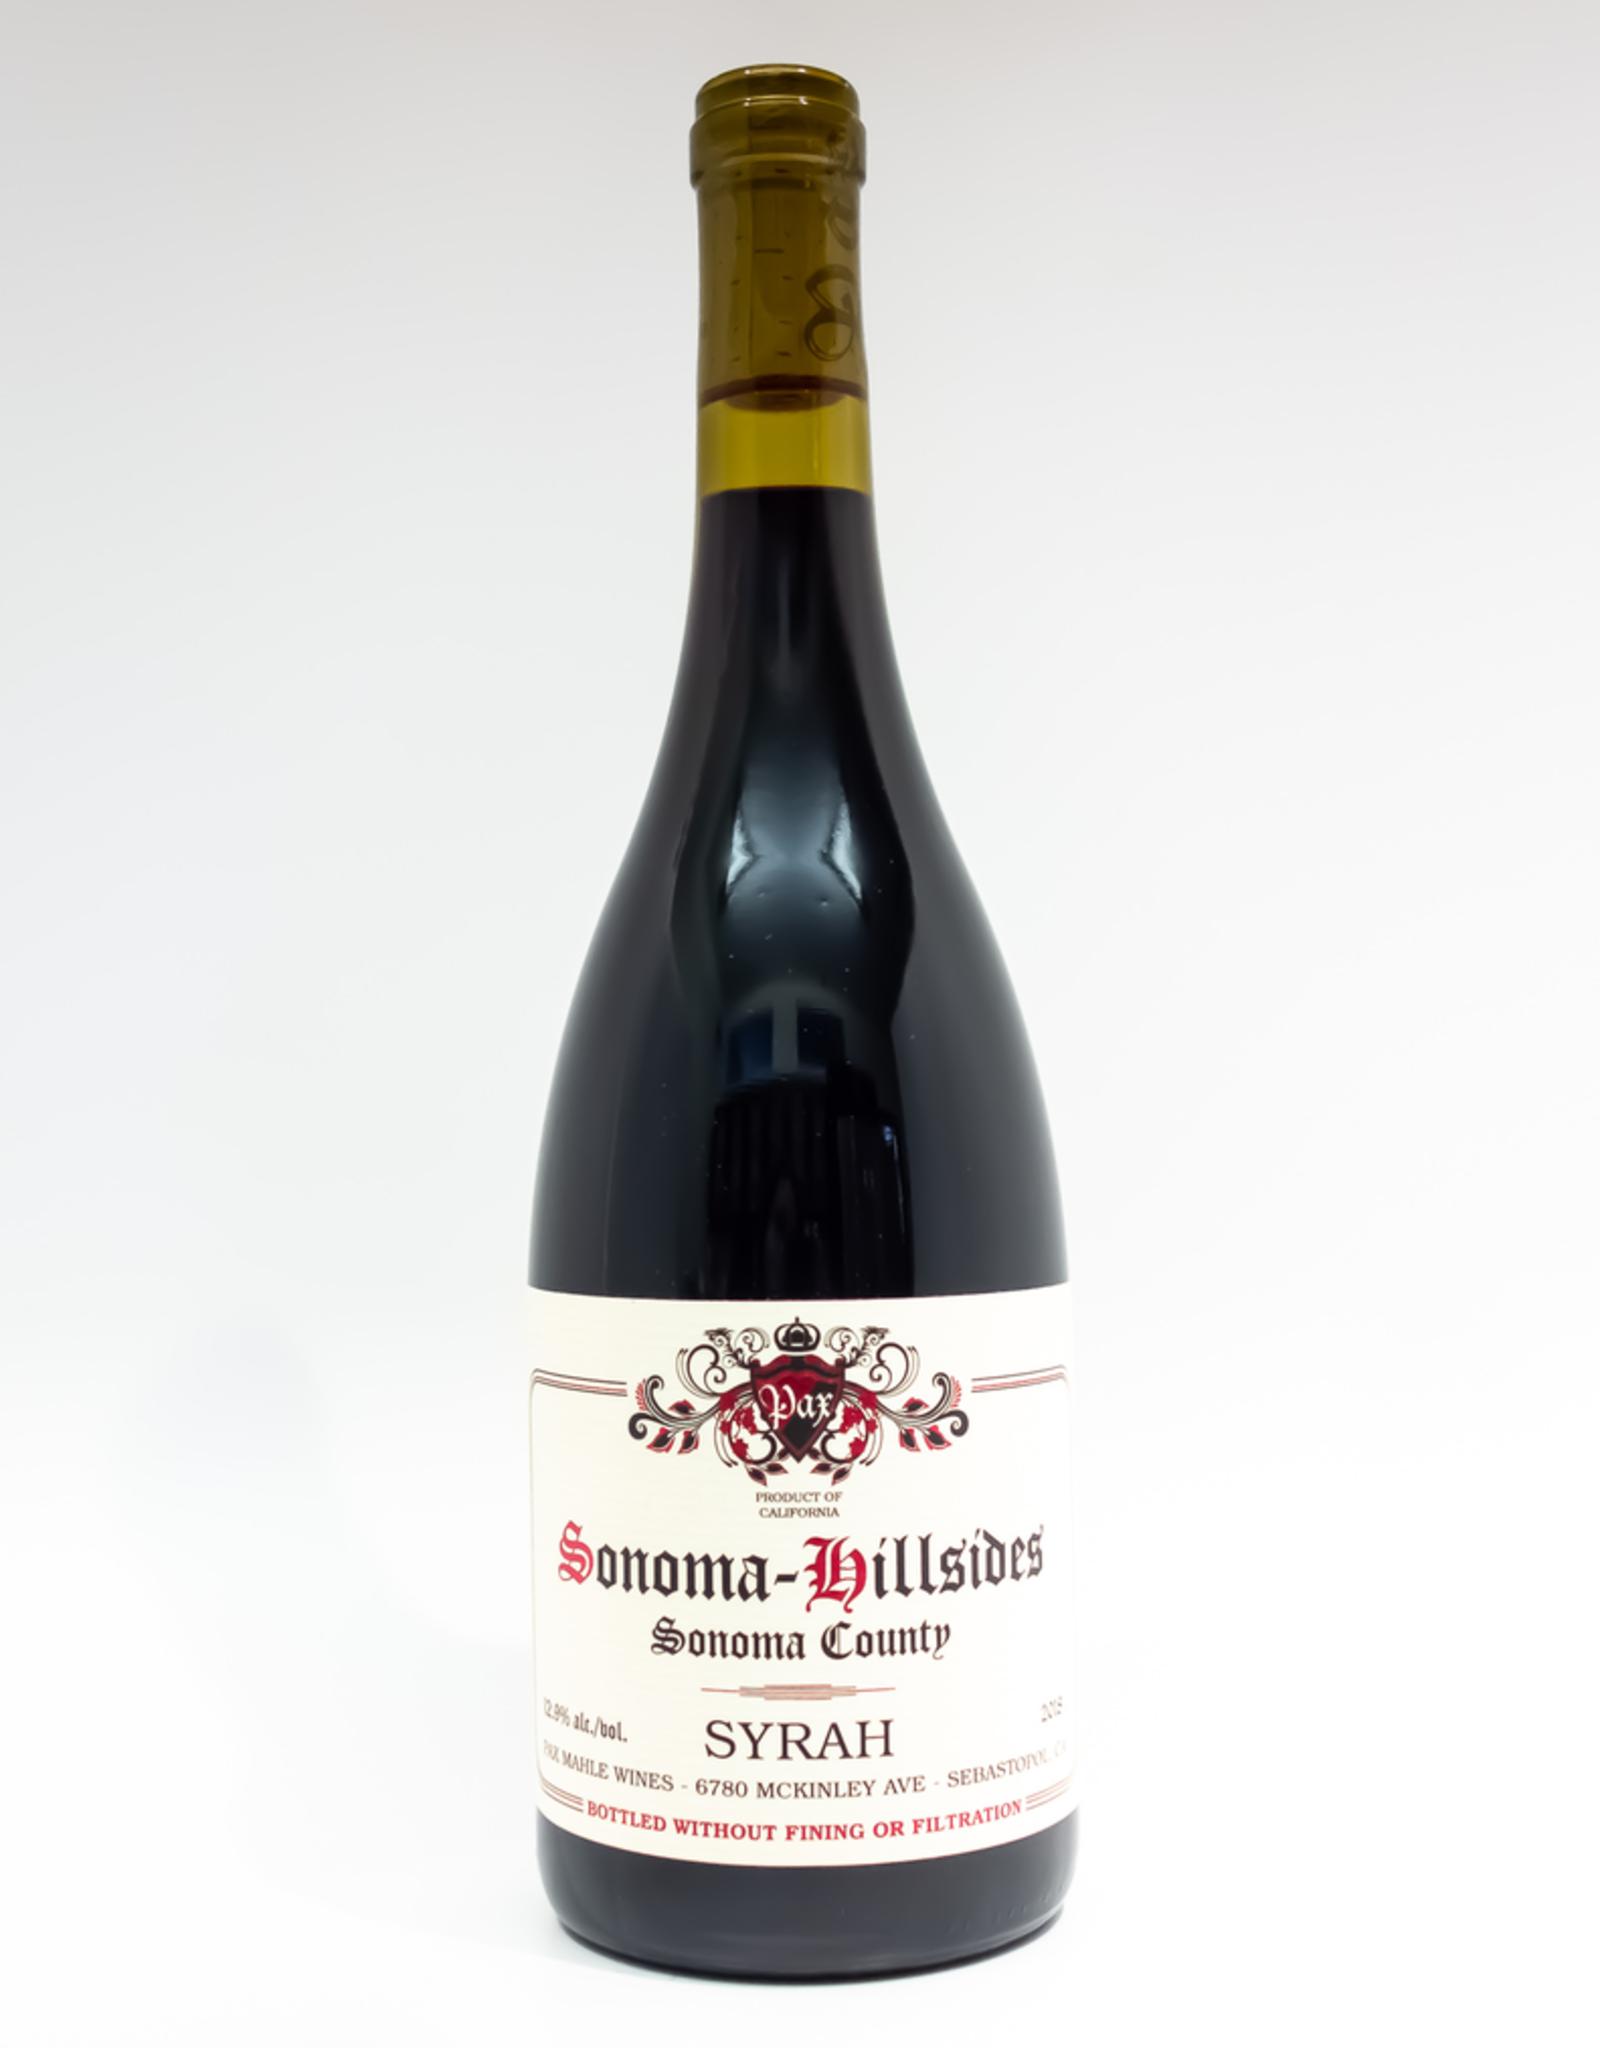 Wine-Red-Lush Pax Mahle Wines Syrah 'Sonoma Hillsides' Sonoma Valley 2018